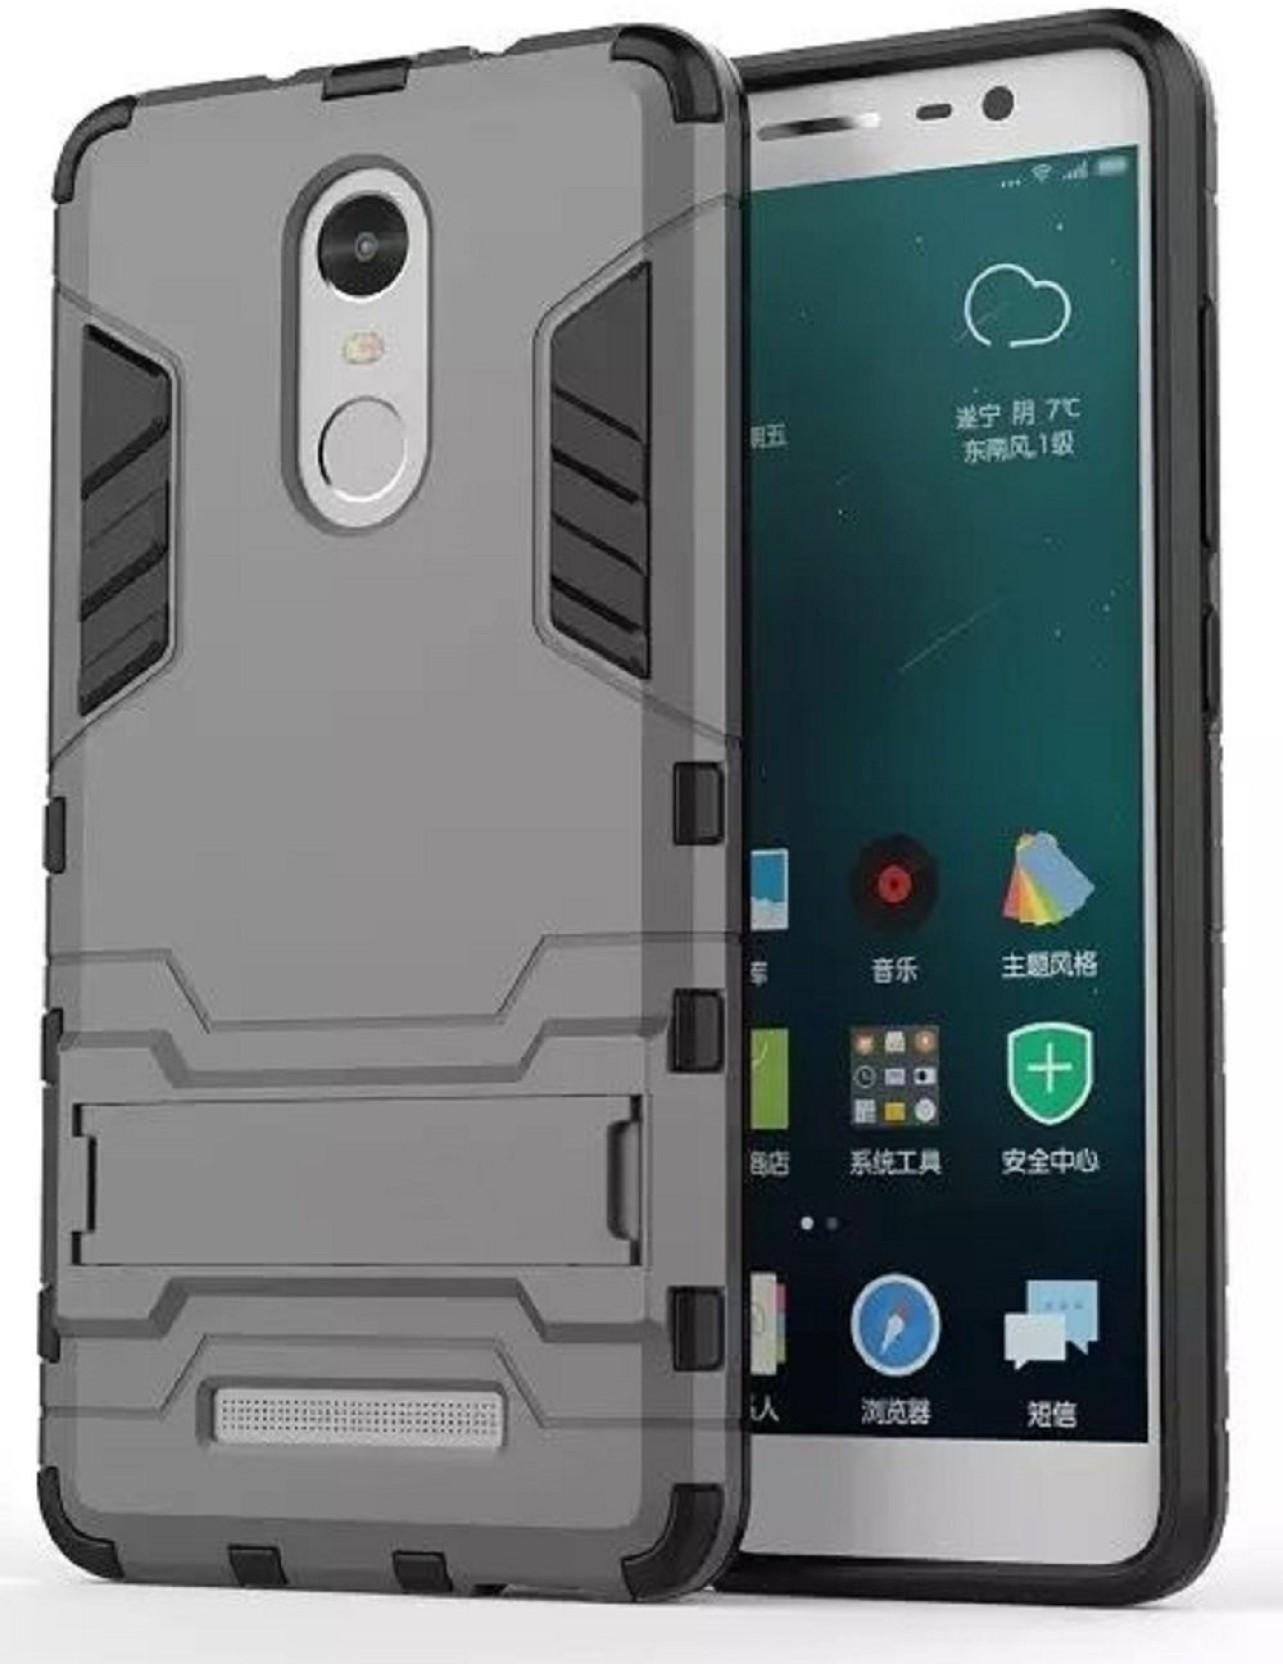 Modik Back Cover For Redmi Note 5 Tough Military Grade Heavy Duty D3 Case Xiaomi Pro Kickstand Armor Series Robot Home